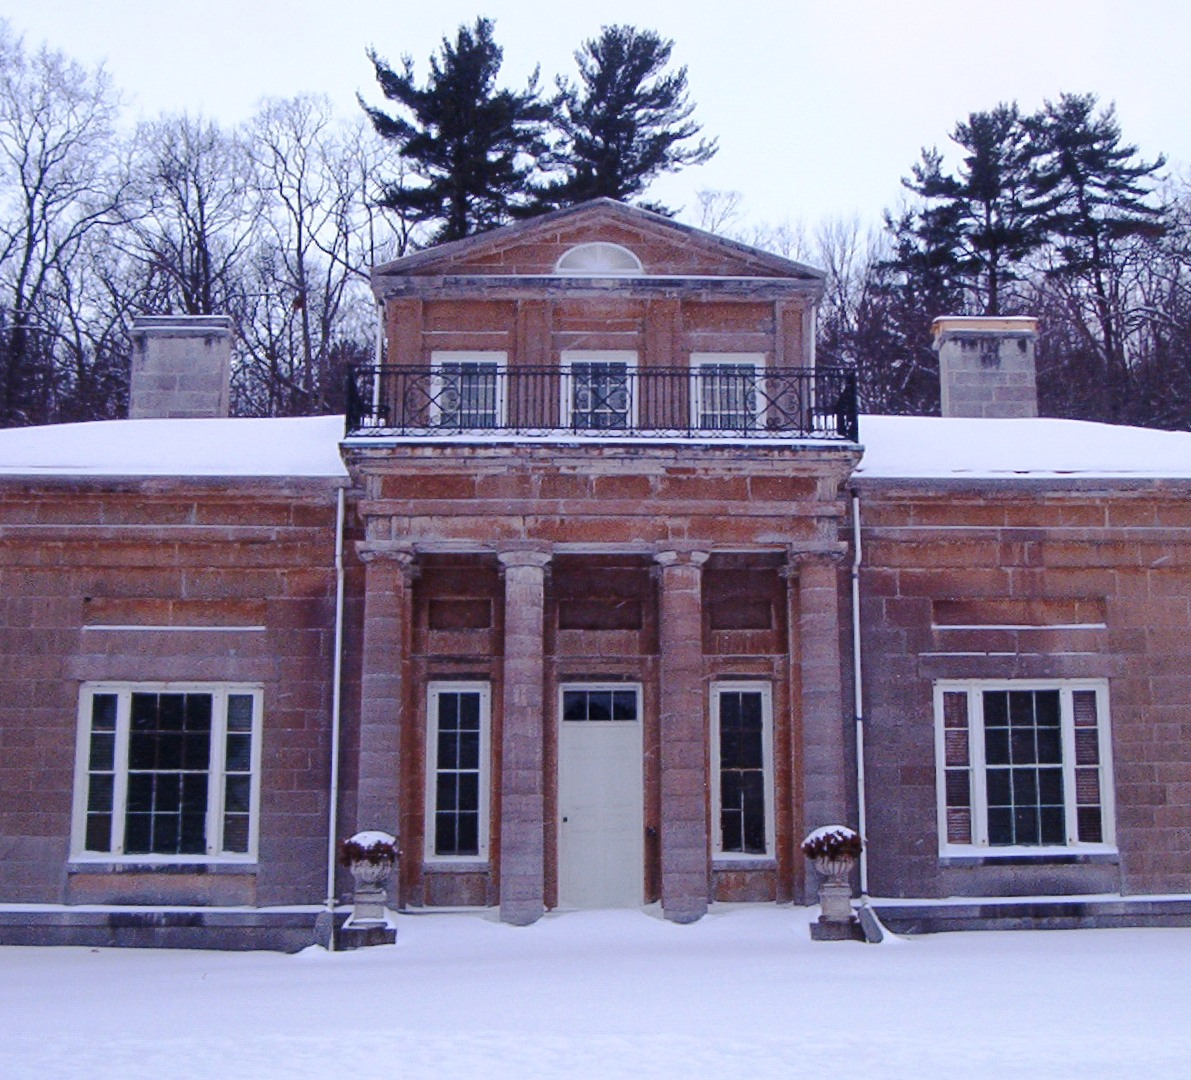 Haunted House York University: Wikipedia